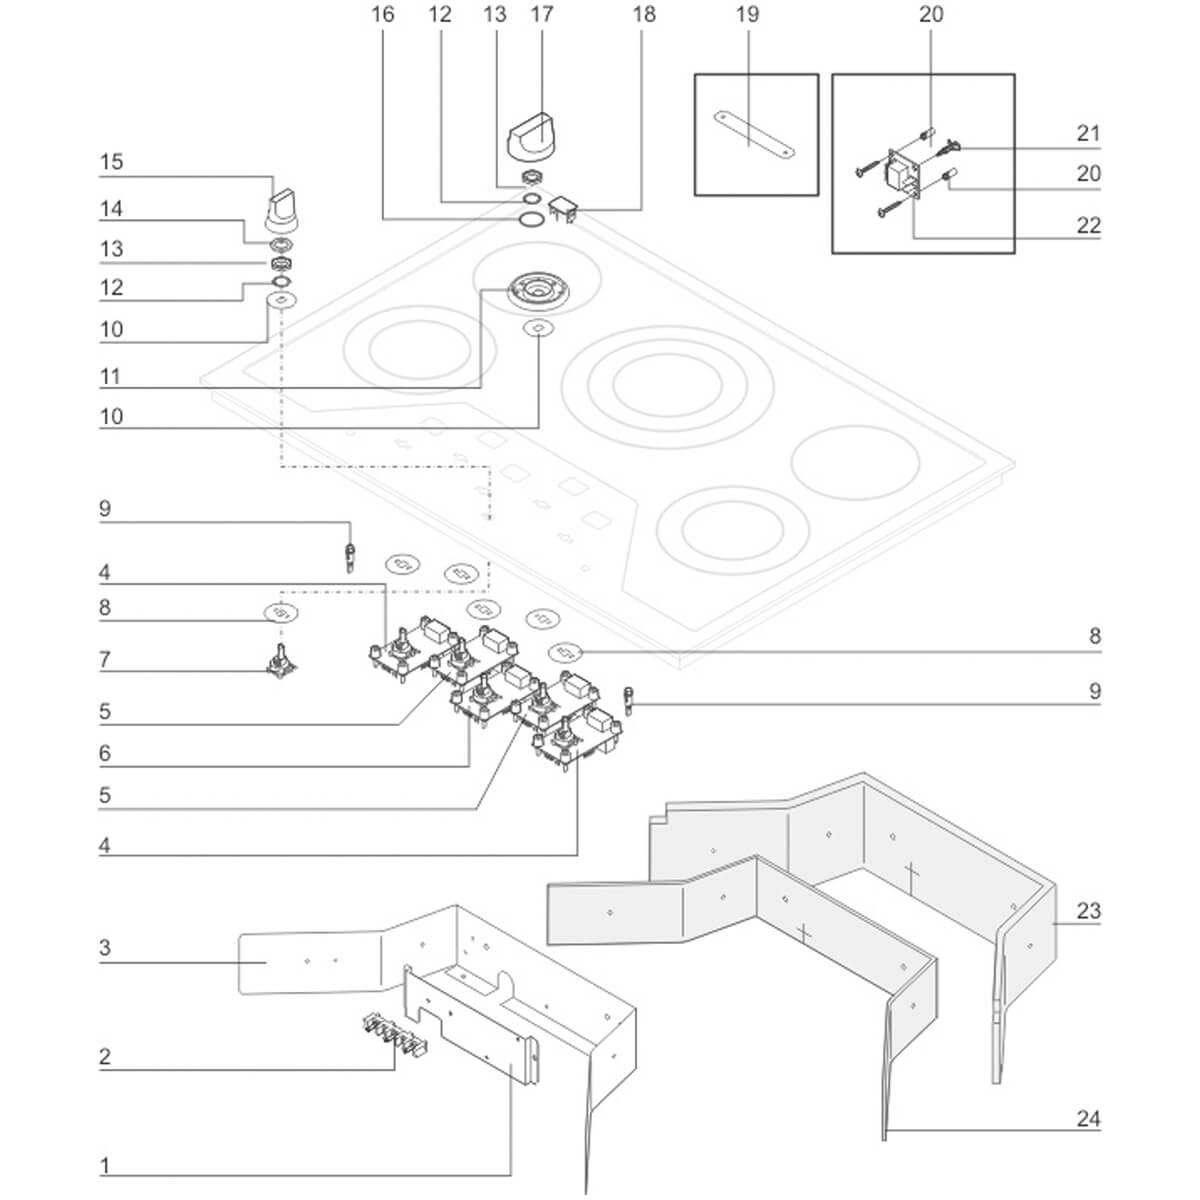 Manipulo Seletor Preto Do Cooktop Elétrico Electrolux ECI65 - 18314700